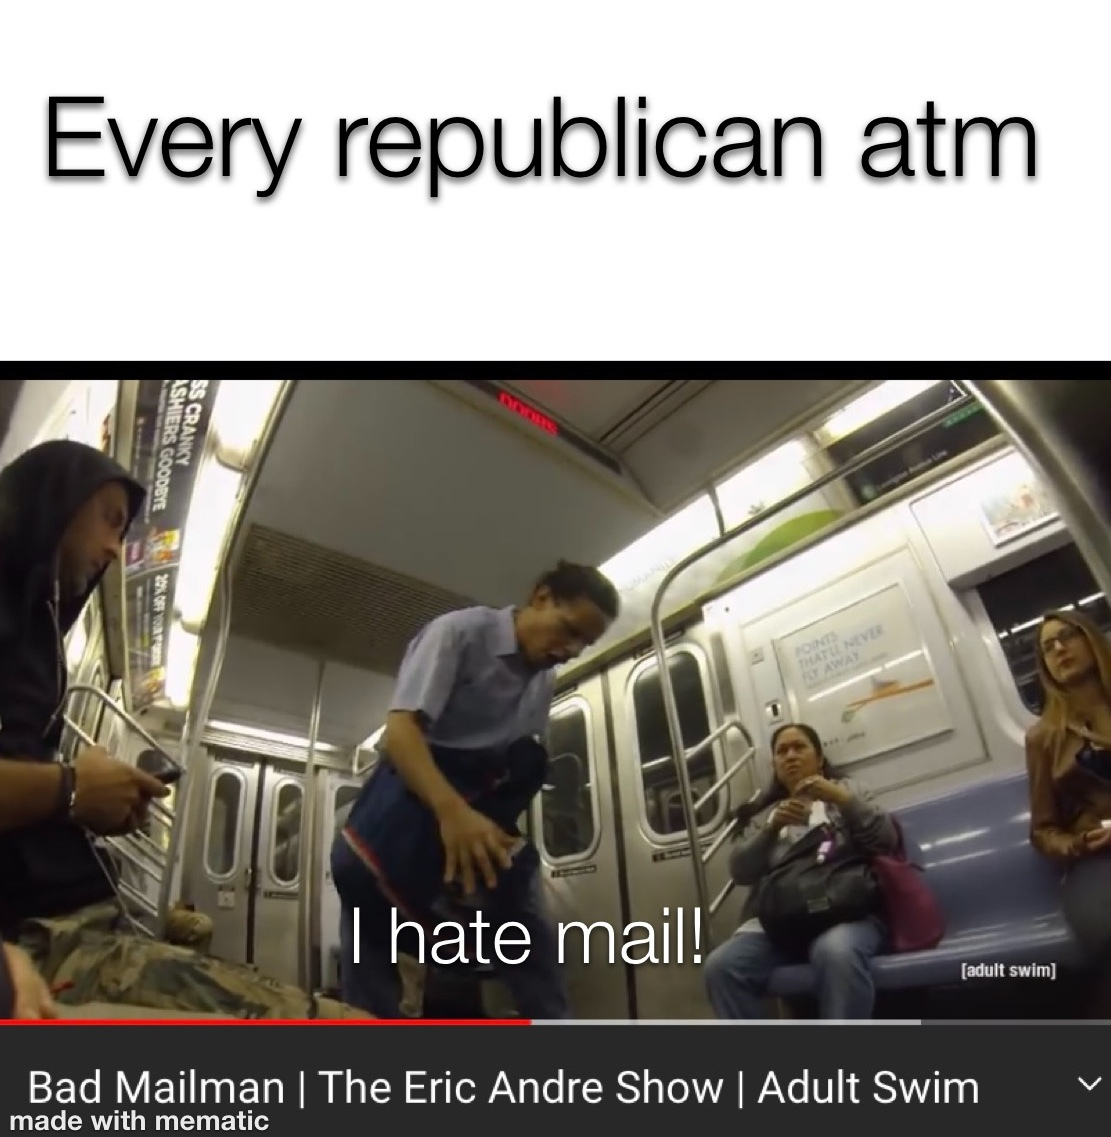 he hates mail - meme